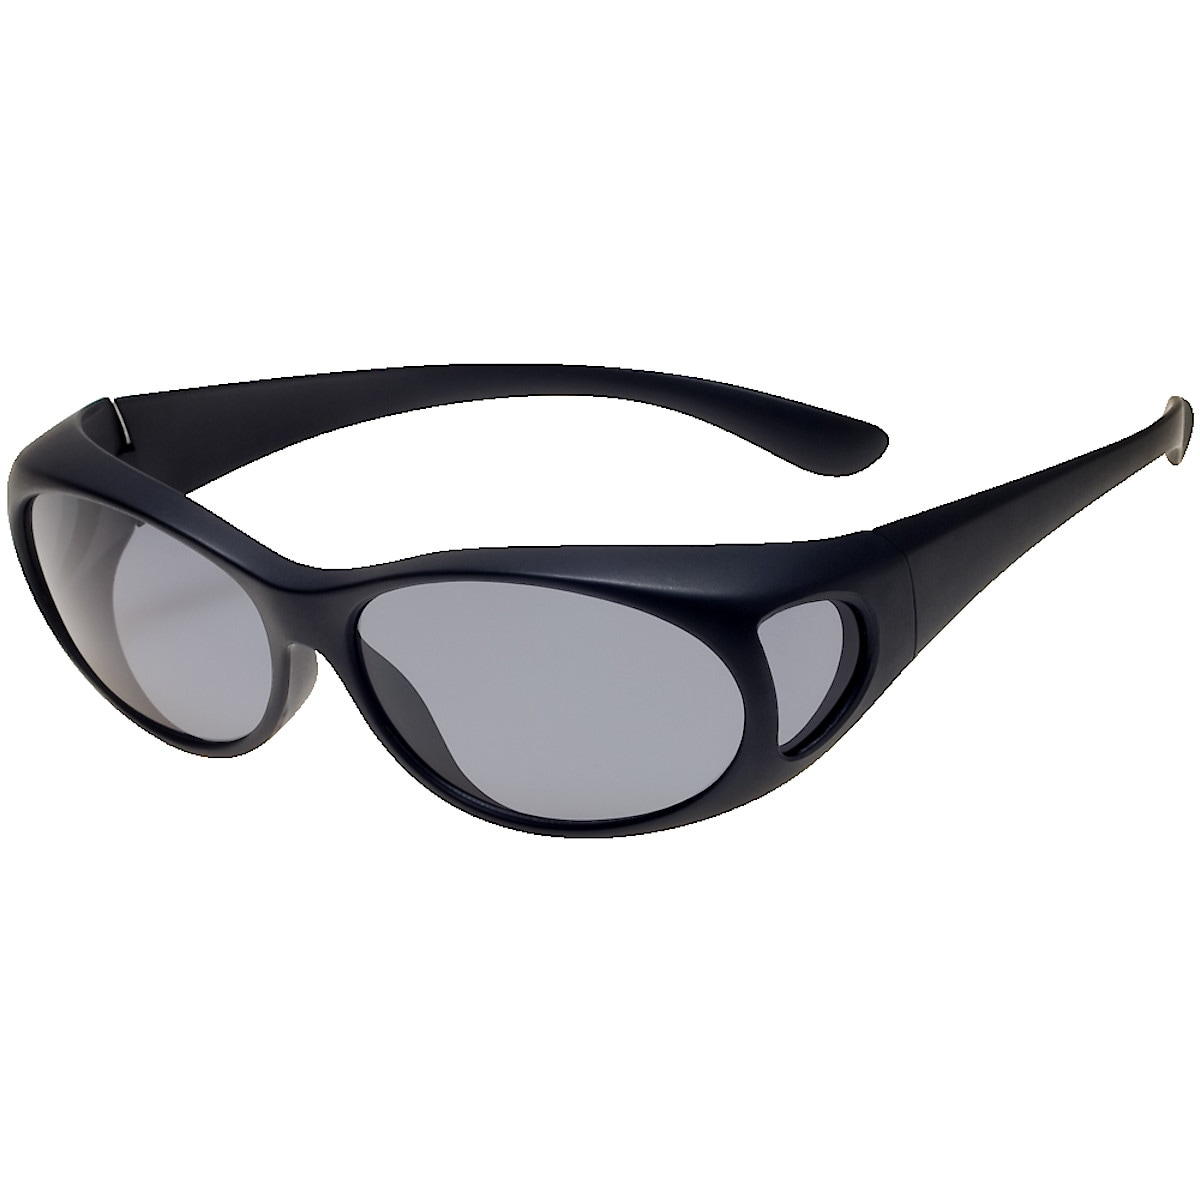 OTG solbrille